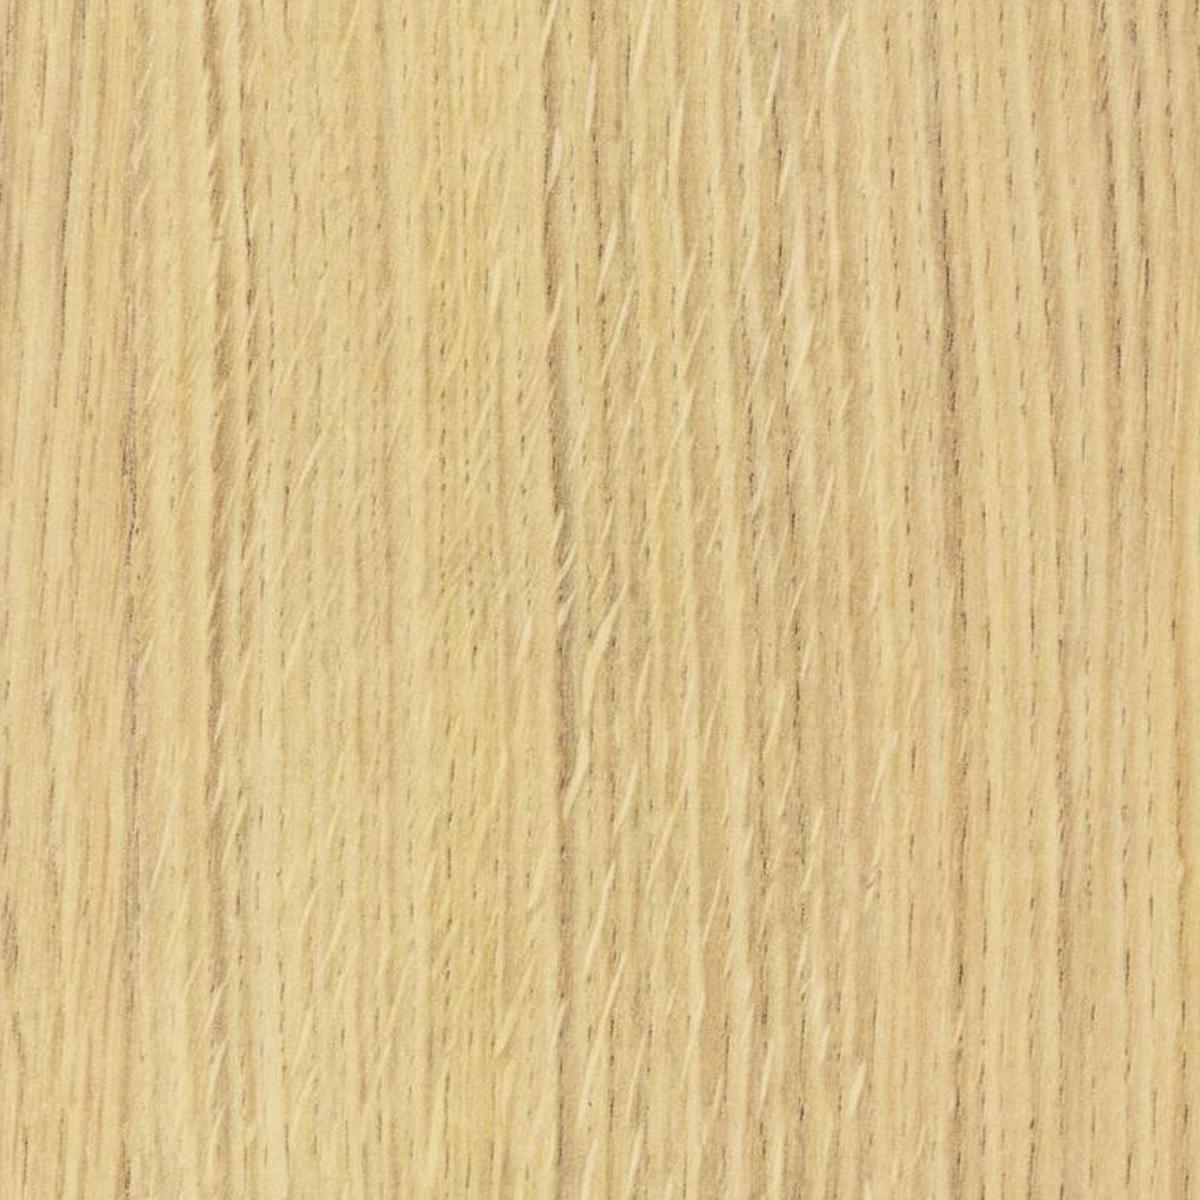 118 Finnish Oak Laminate Countertops